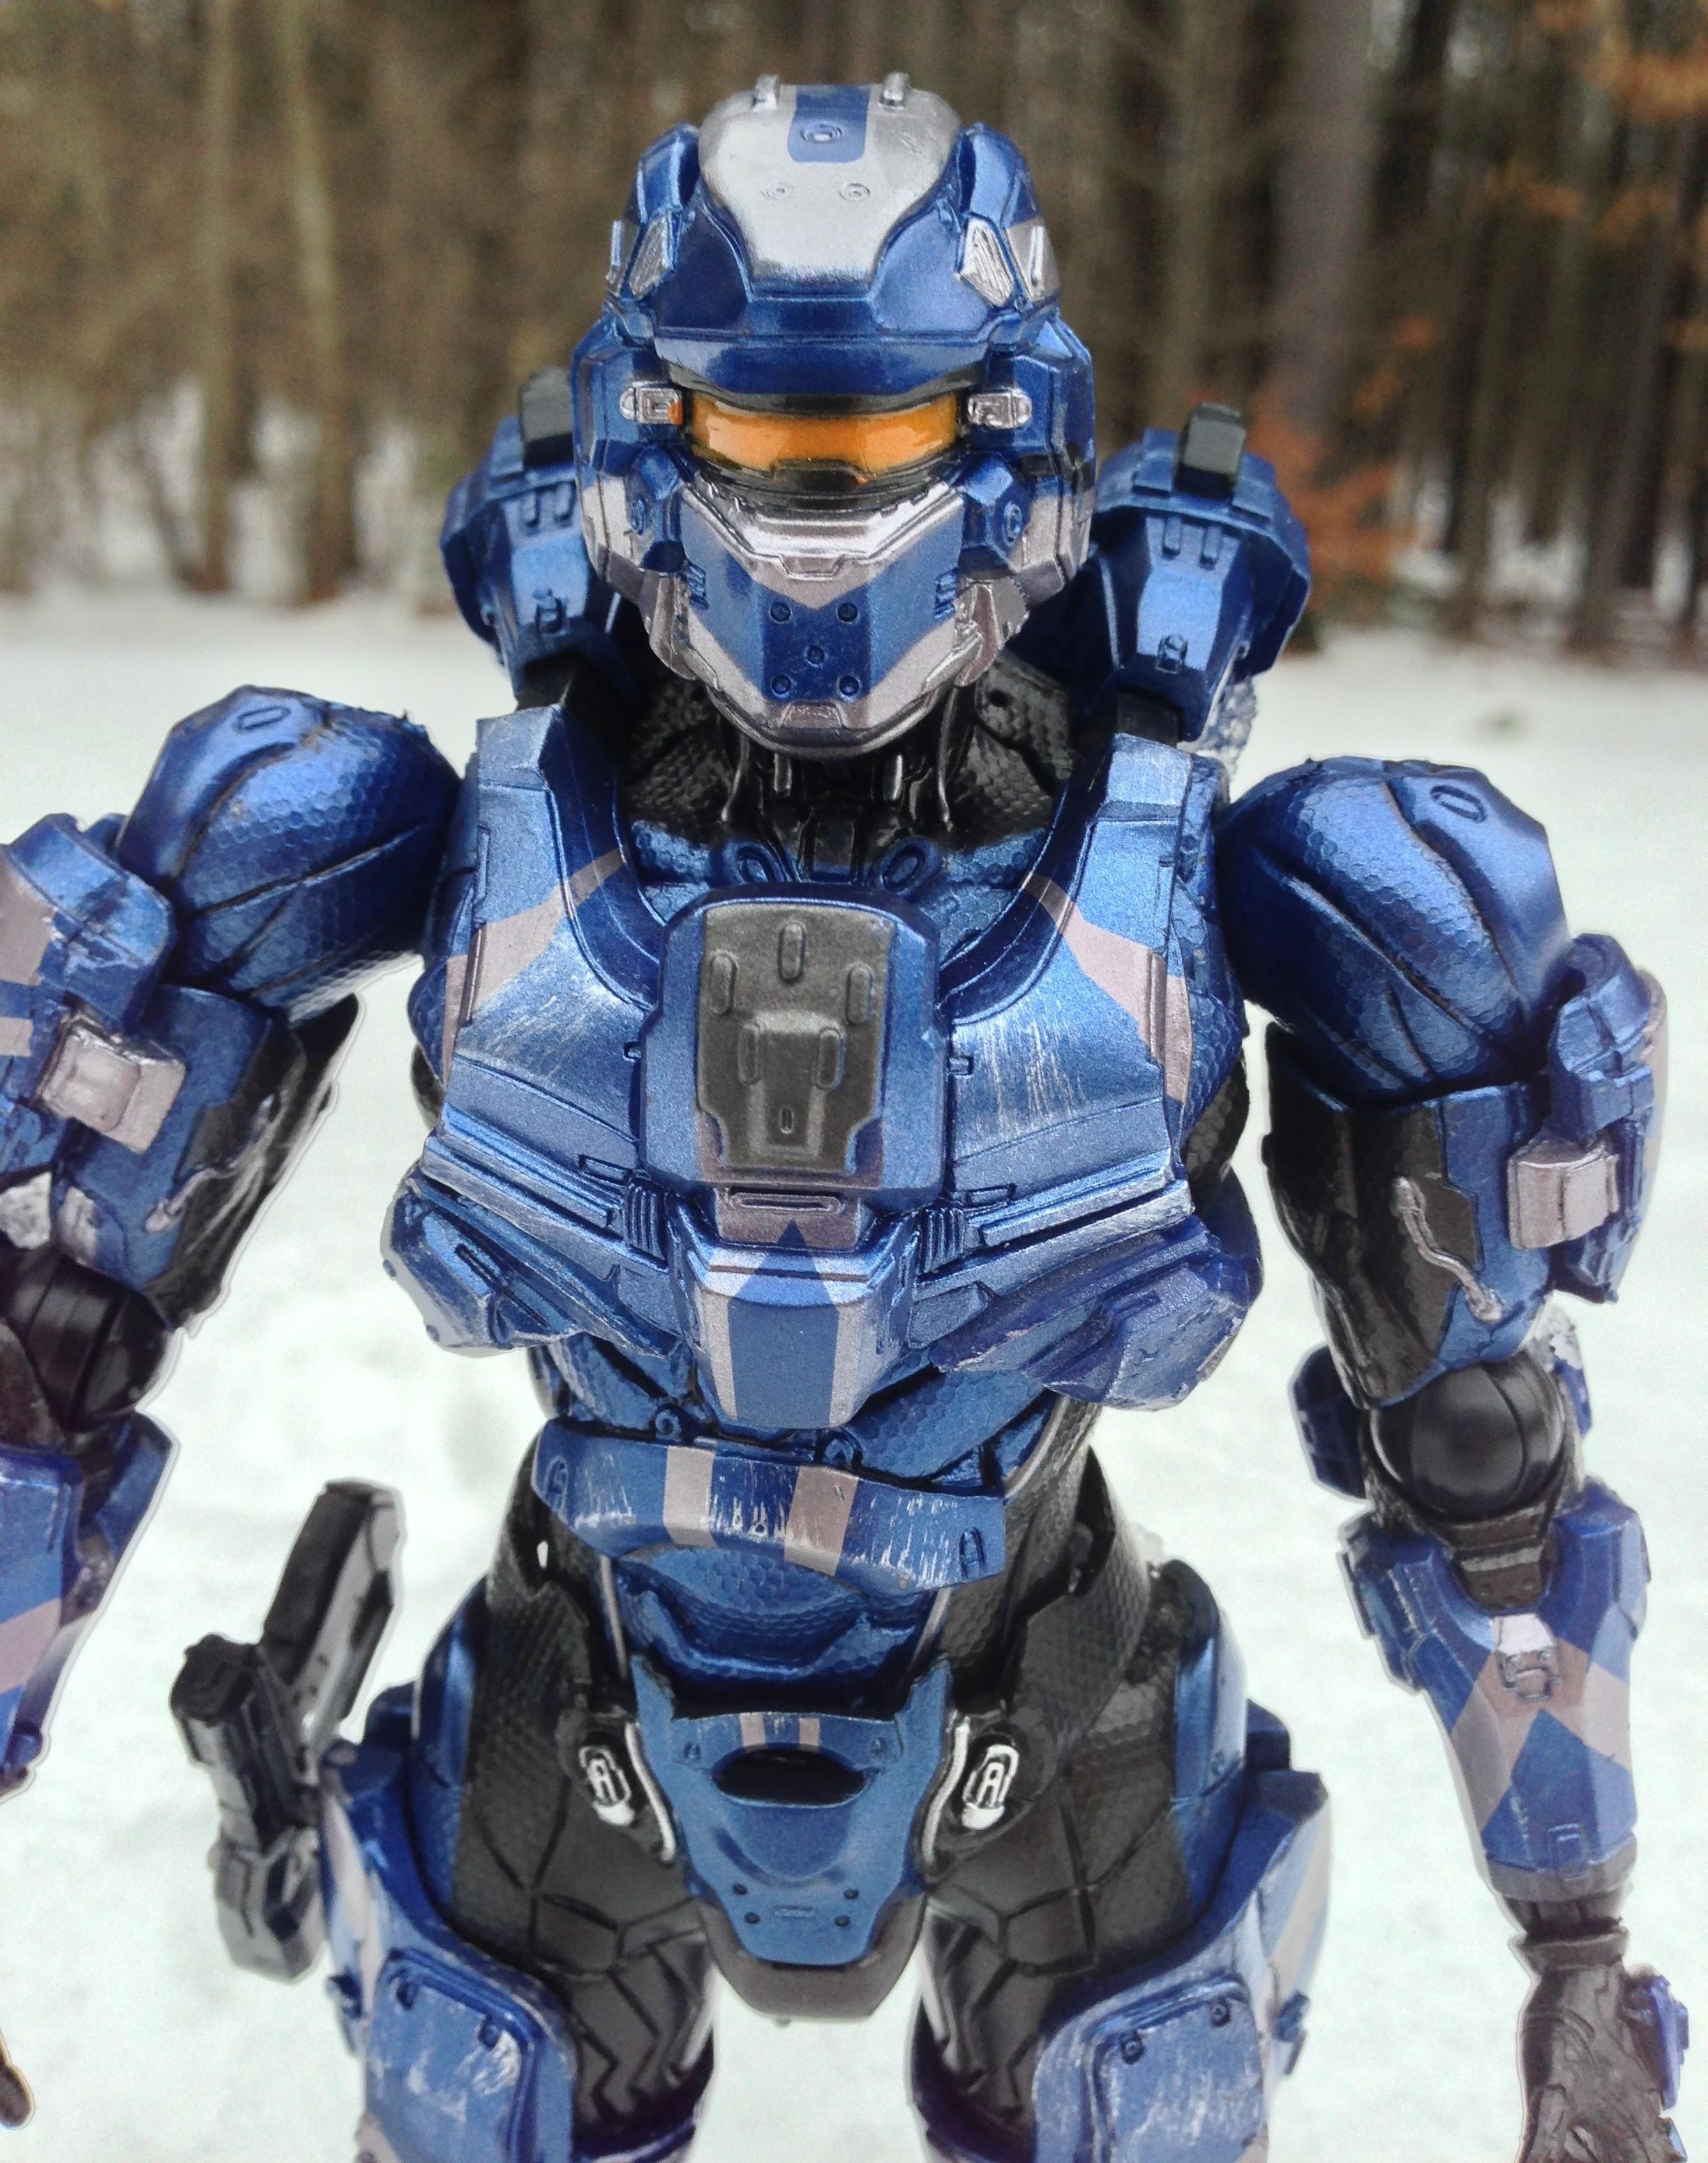 Halo 4 Play Arts Kai Spartan Warrior Figure Review (Square